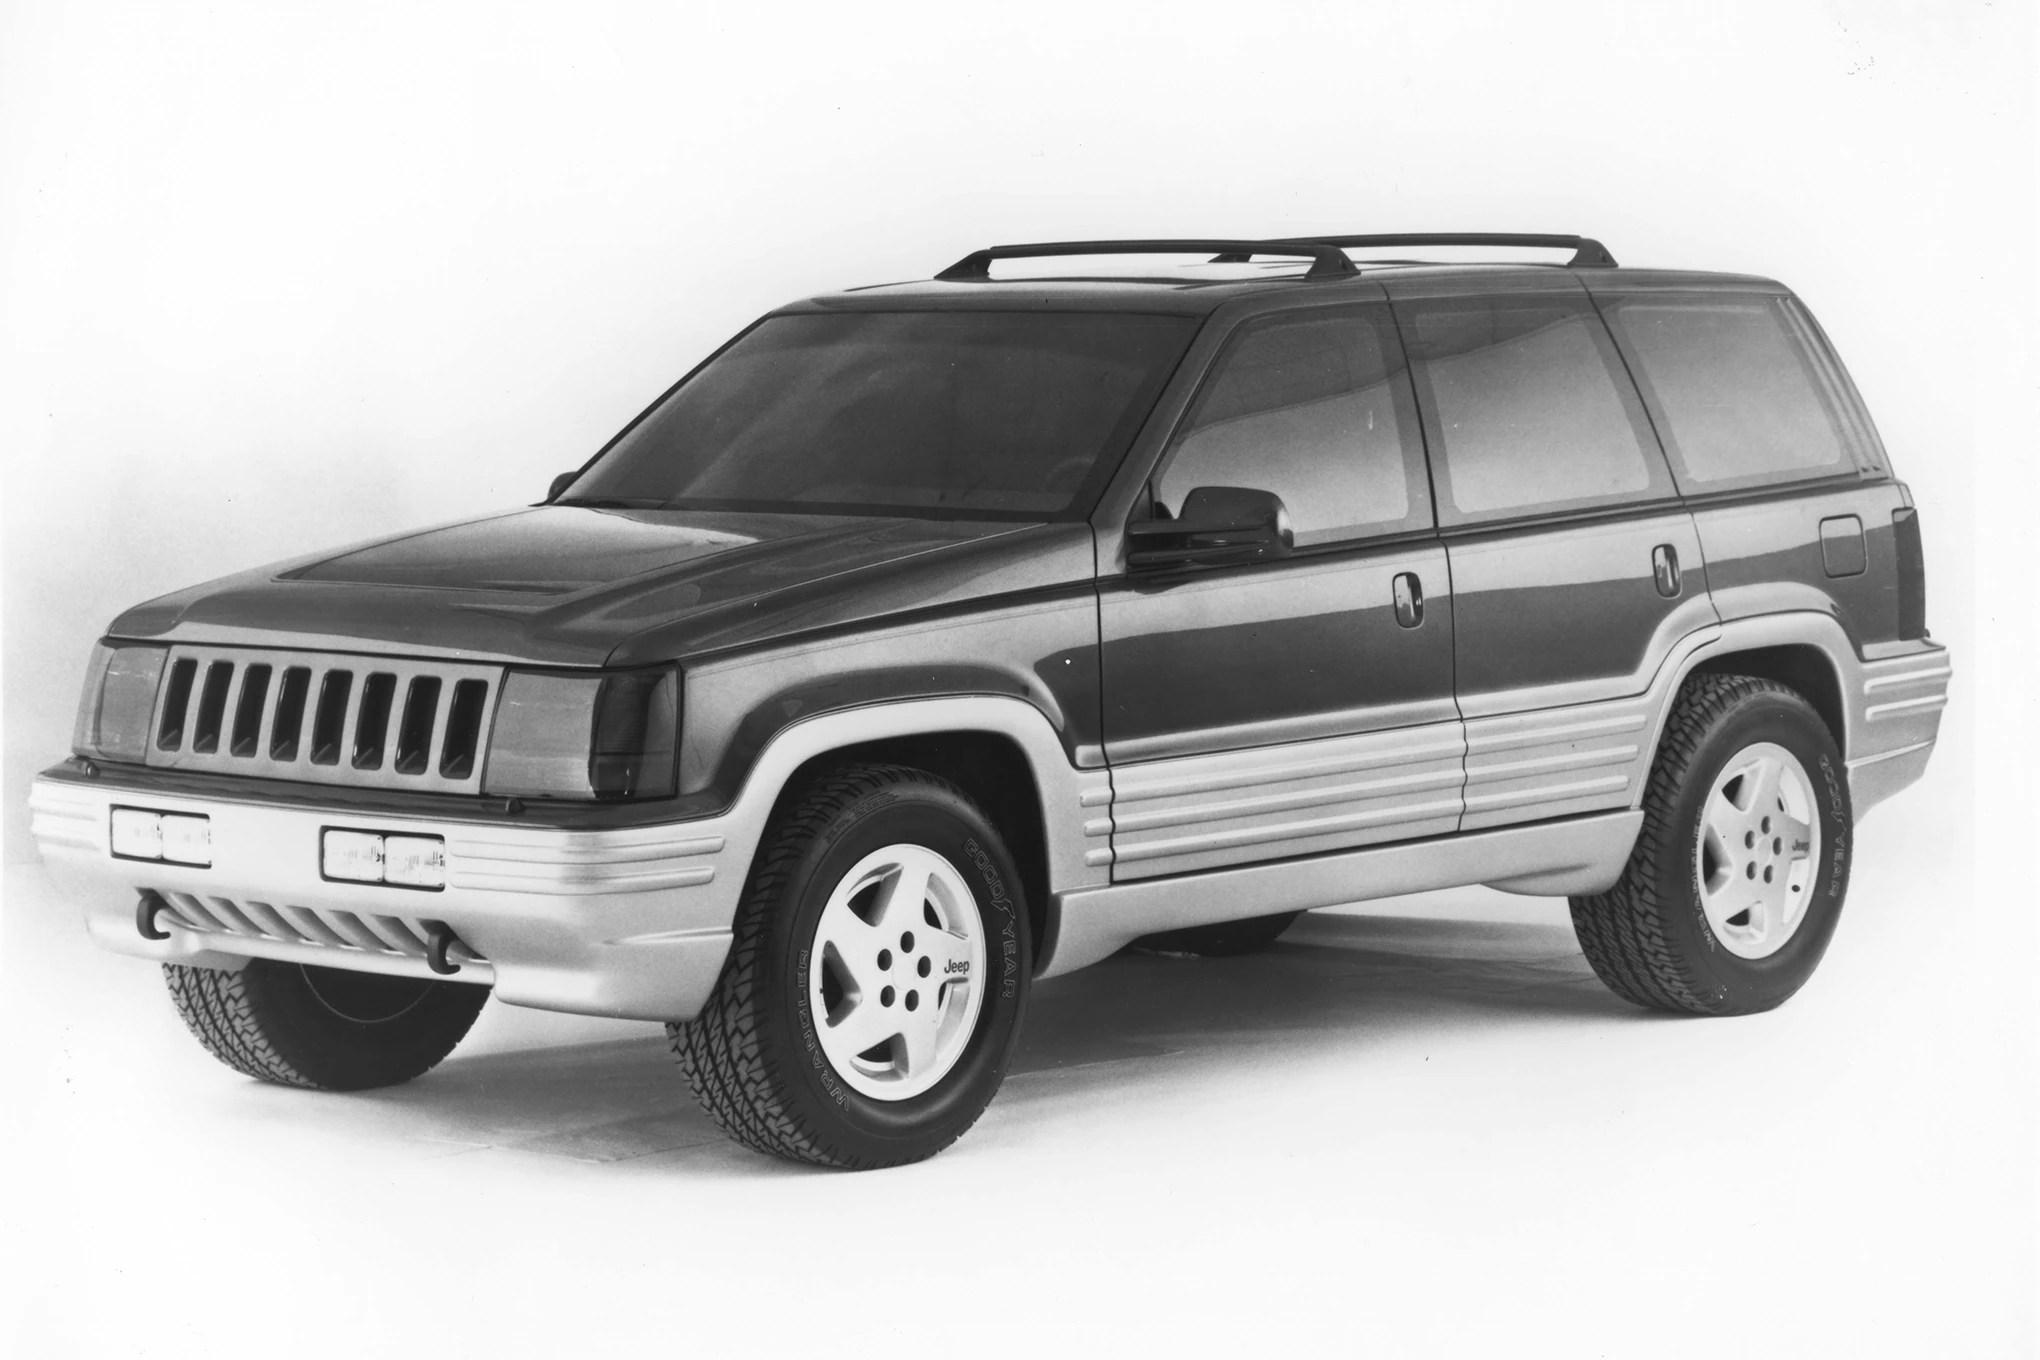 small resolution of  011 1989 jeep concept 1 012 1993 jeep grand cherokee laredo